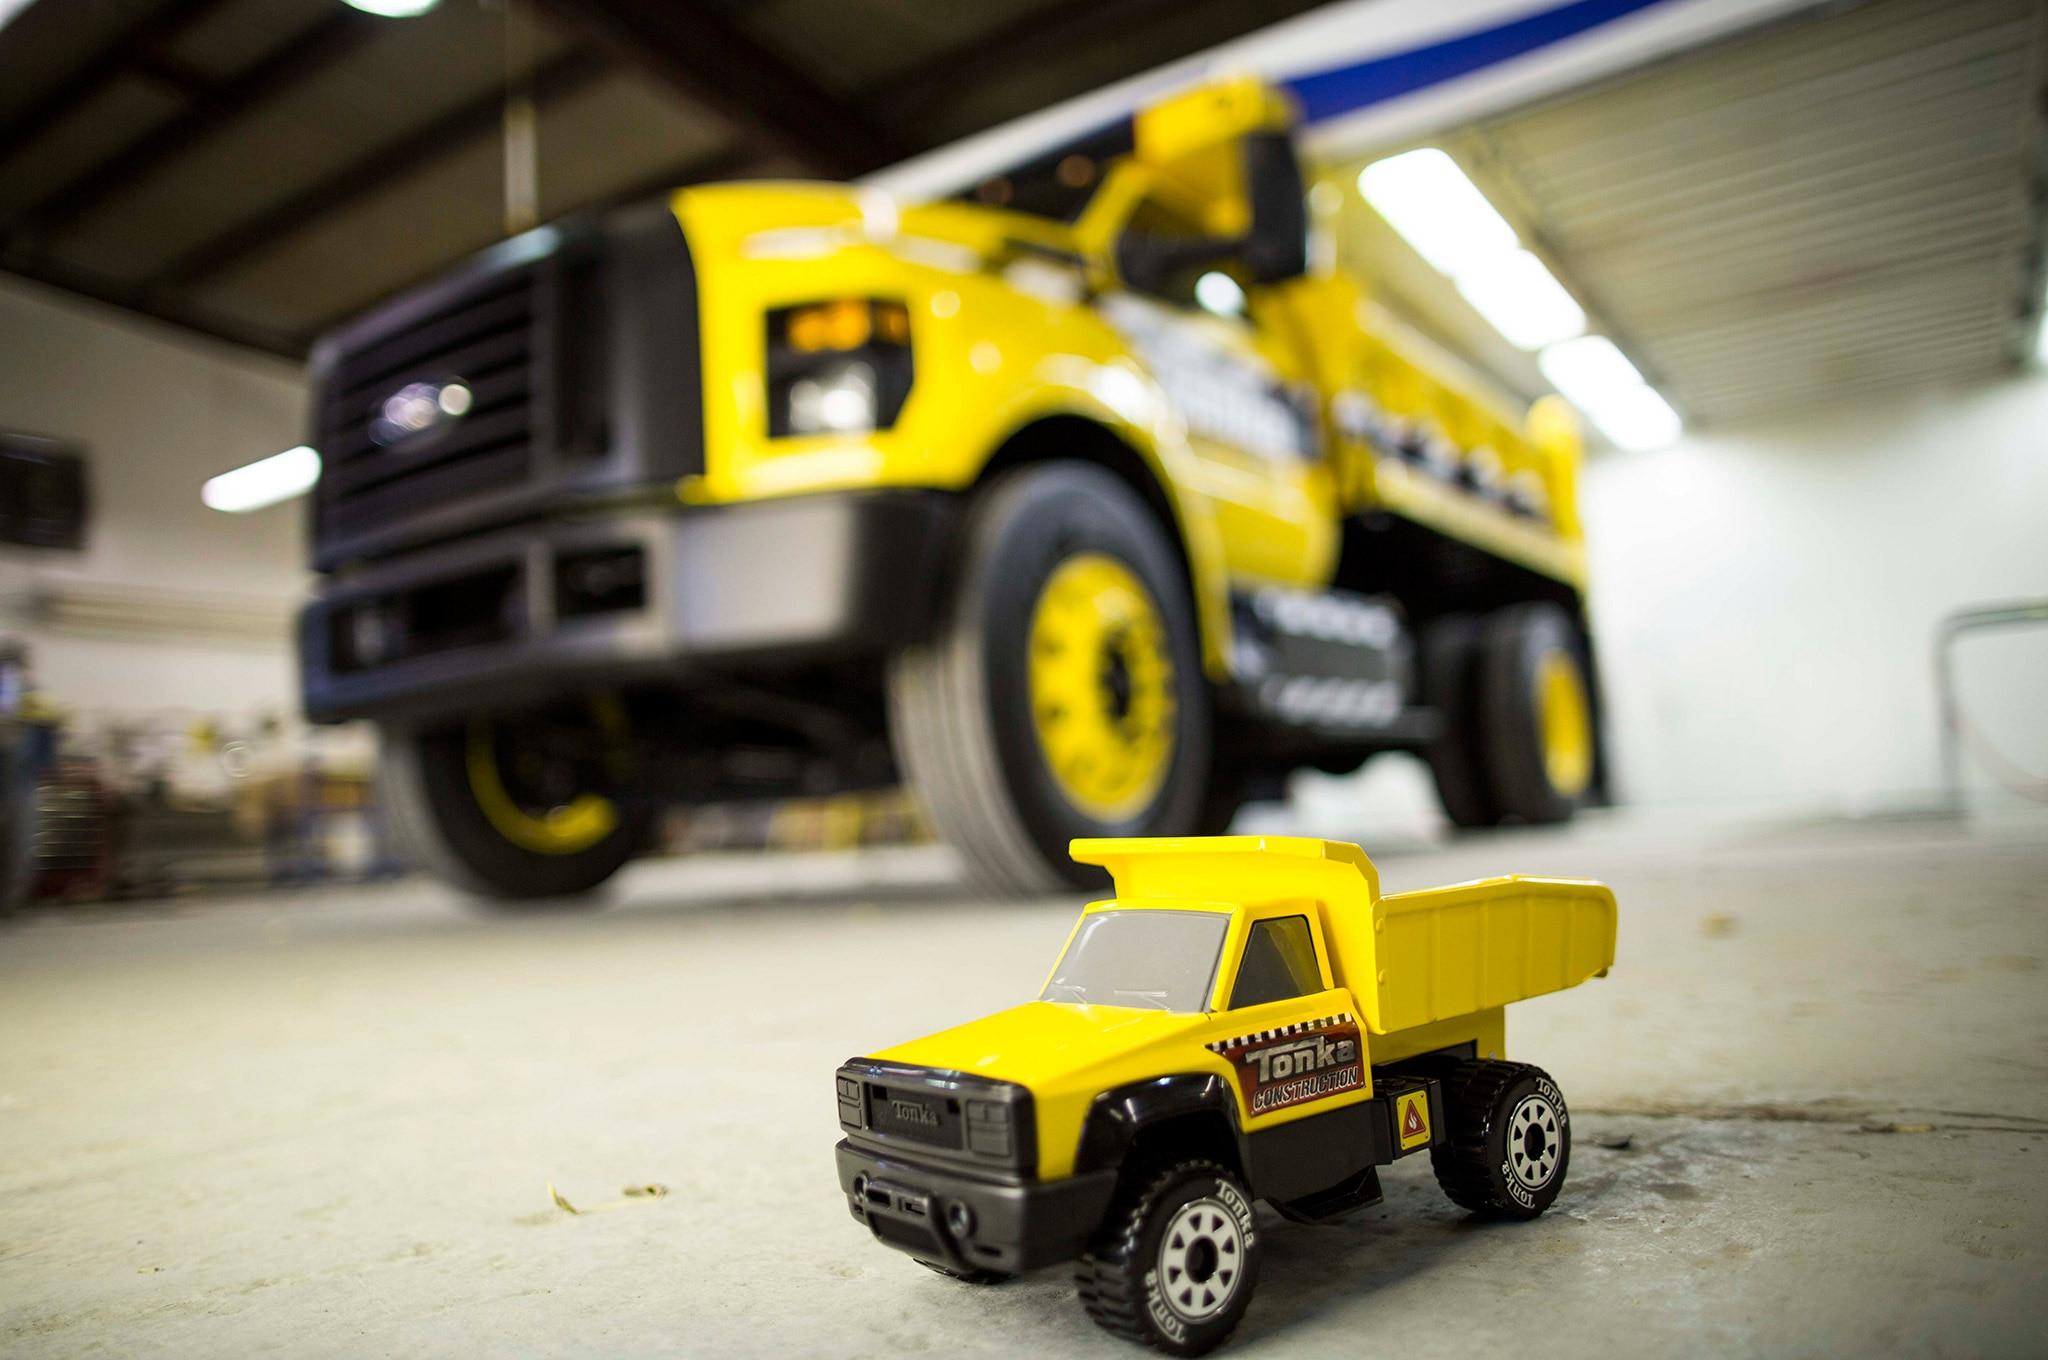 001 Ford F 750 Tonka Lead Toy